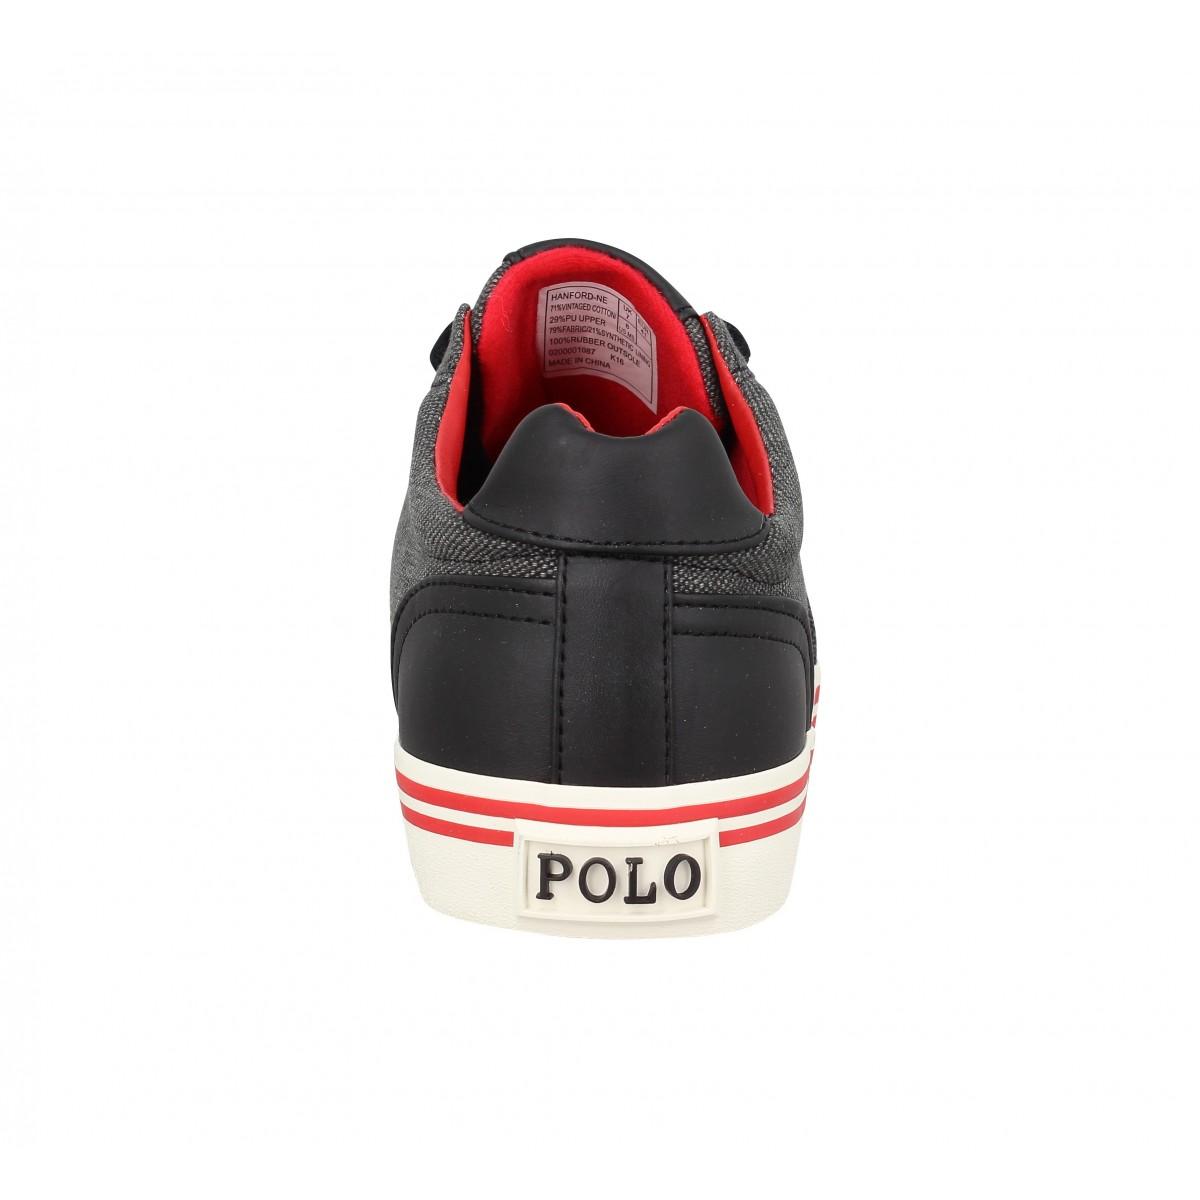 4f6df5d9b063 Polo ralph lauren hanford toile black homme   Fanny chaussures